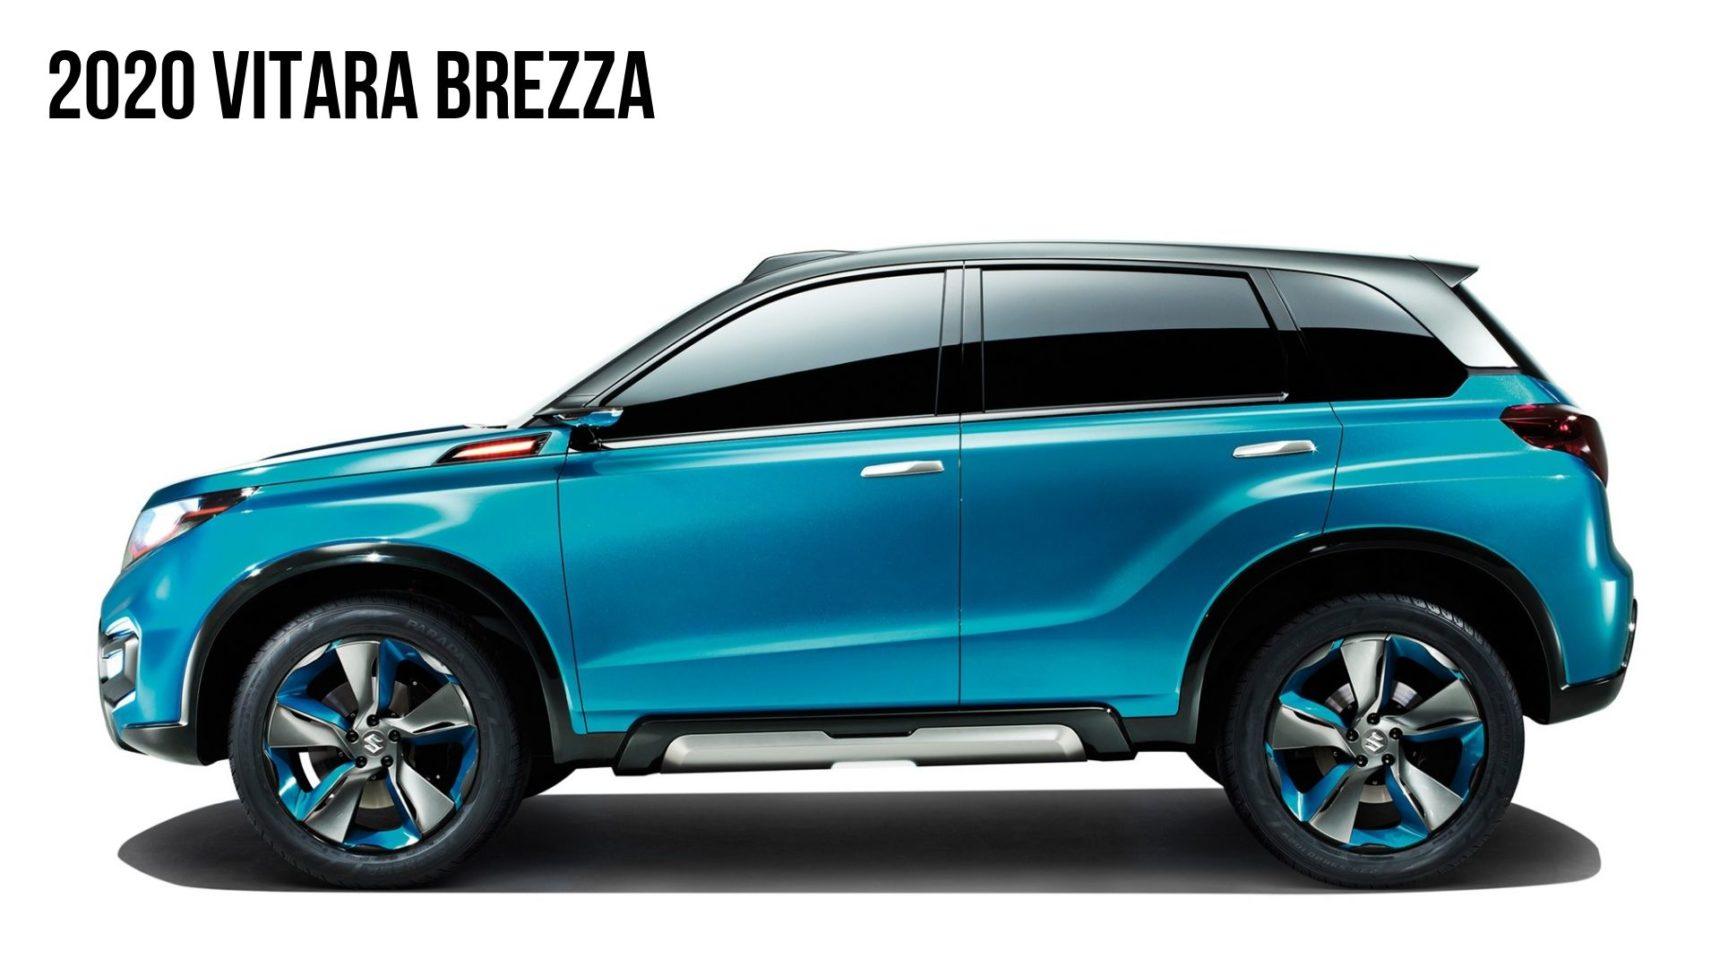 2020 Suzuki Jimny: News, Design, Release >> Upcoming 9 Maruti Suzuki Cars In India Vitara Brezza